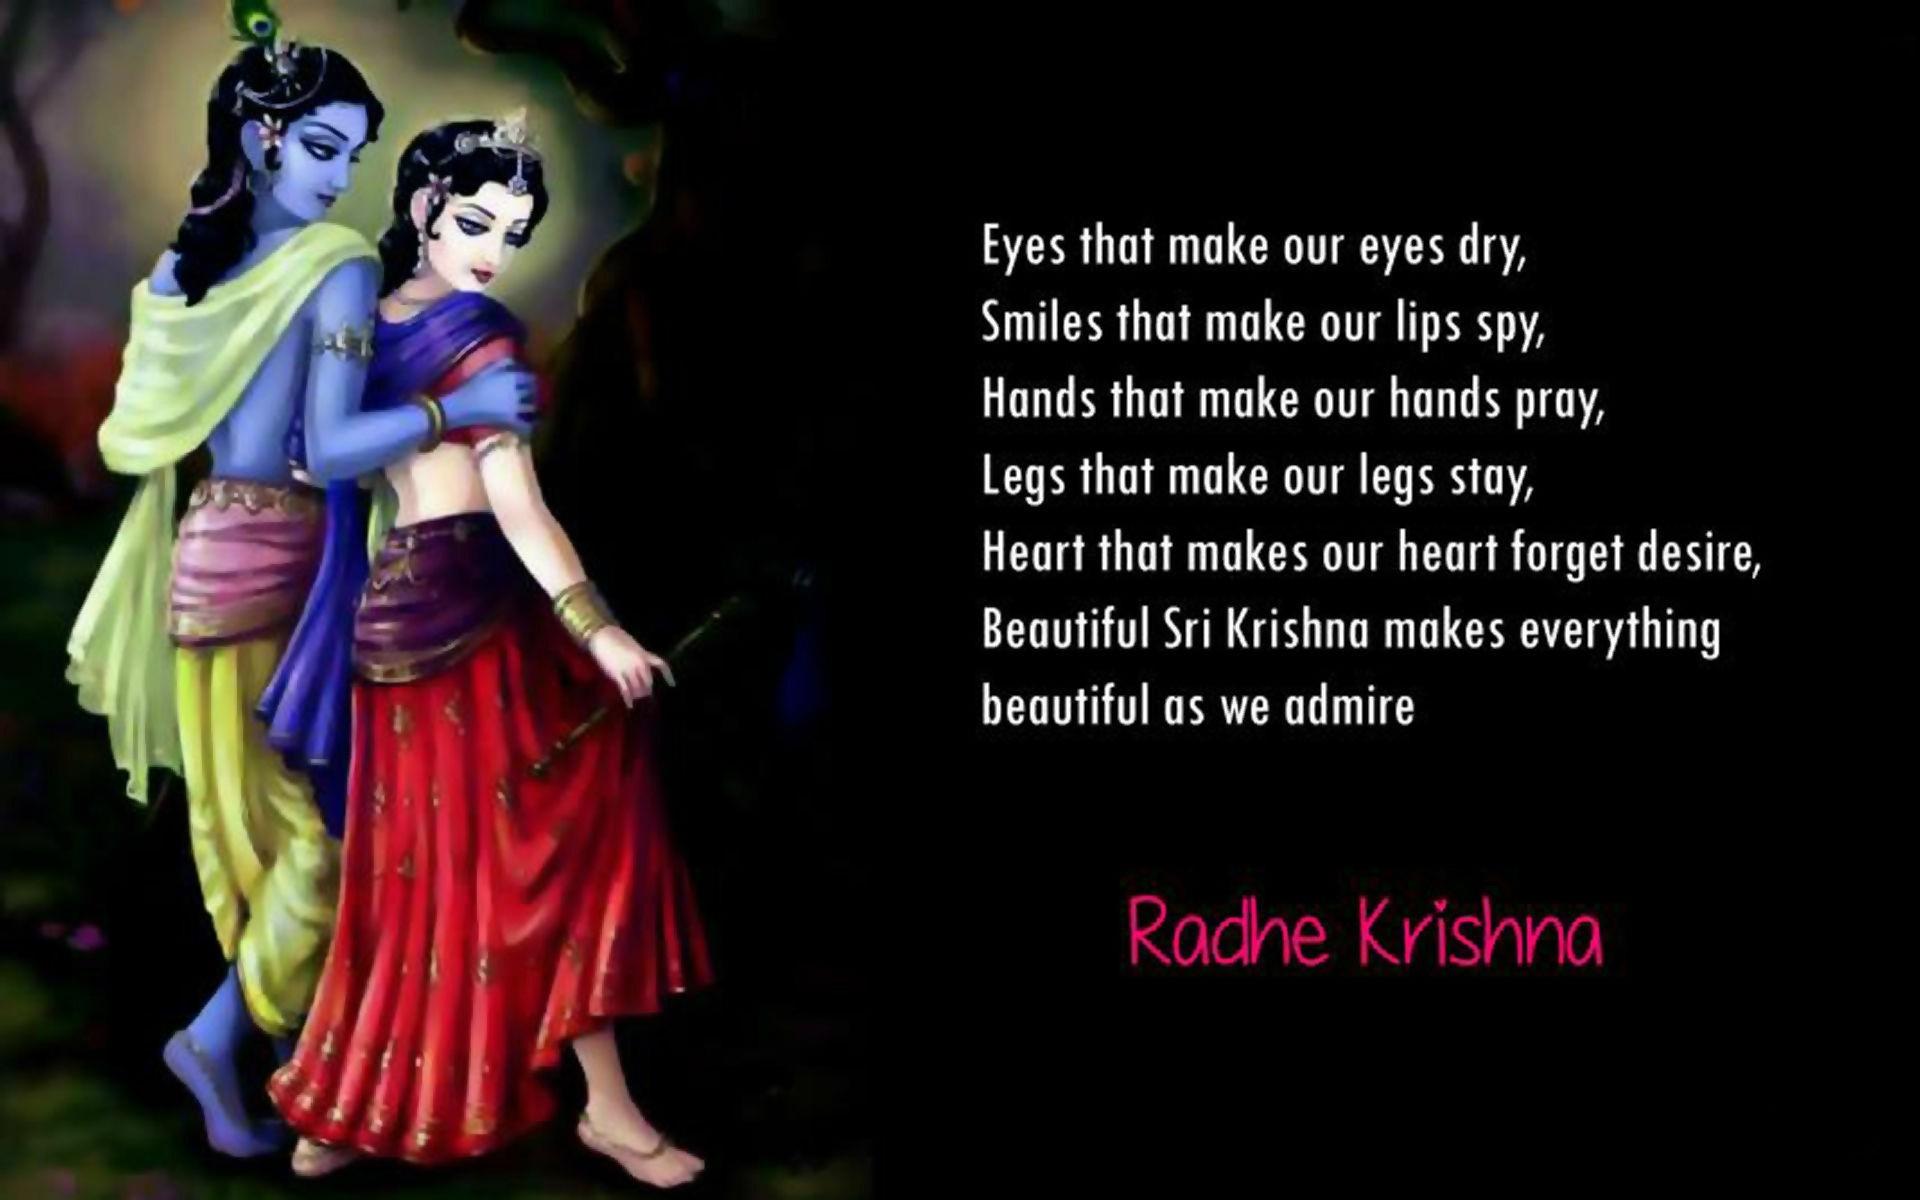 Lord Radha Krishna Wish Nice Quotes Hd Wallpapers Rocks - Good Morning Painting Of Radha Krishna - HD Wallpaper